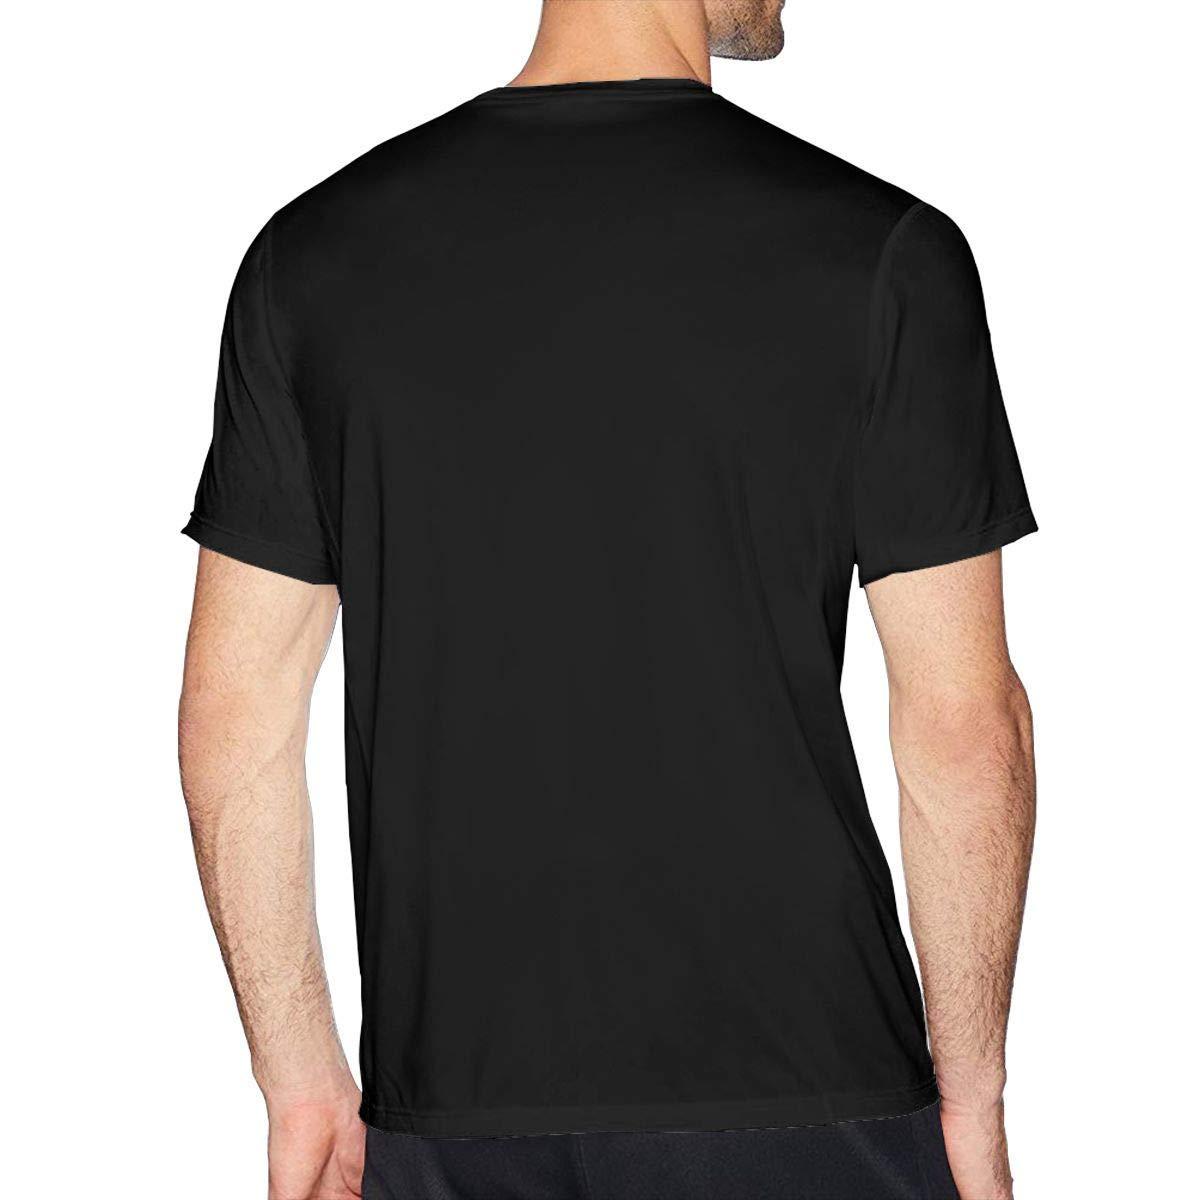 PEGGYNCO Mens Cool BEGONE THOT T-Shirt Black